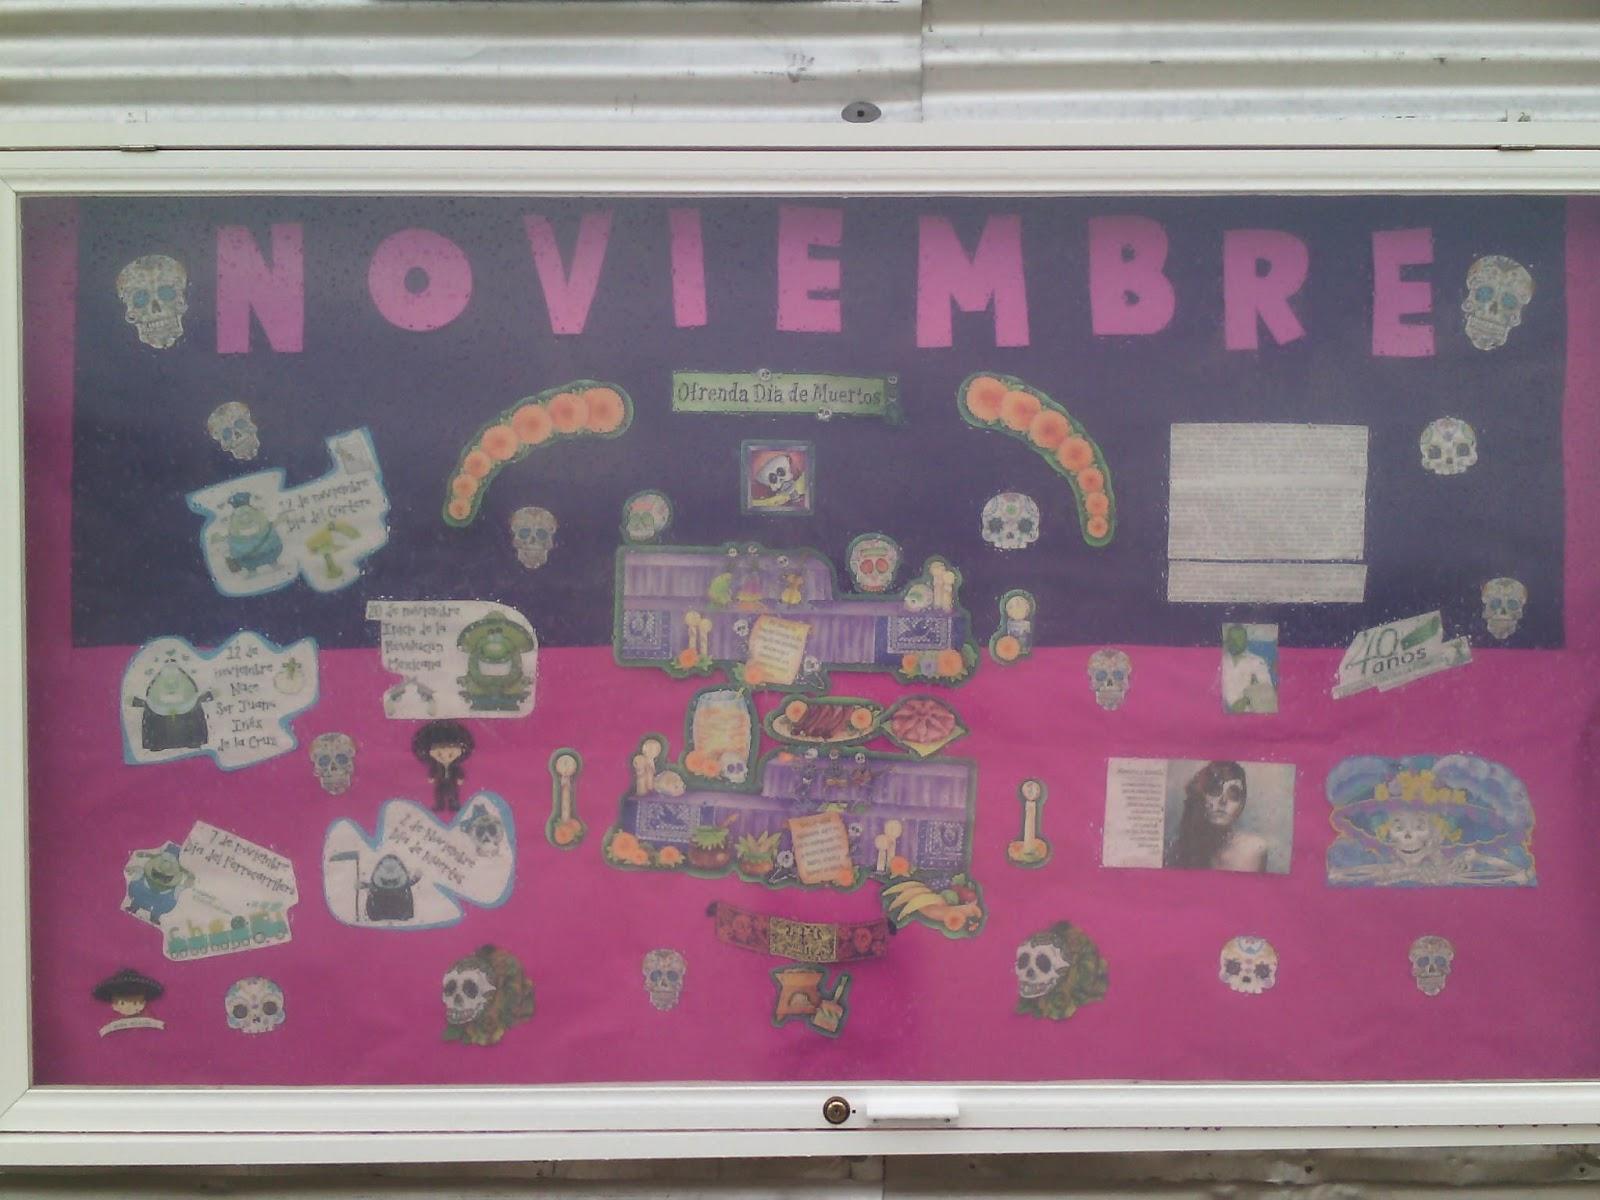 Seccional sur peri dico mural mes de noviembre for Editorial periodico mural